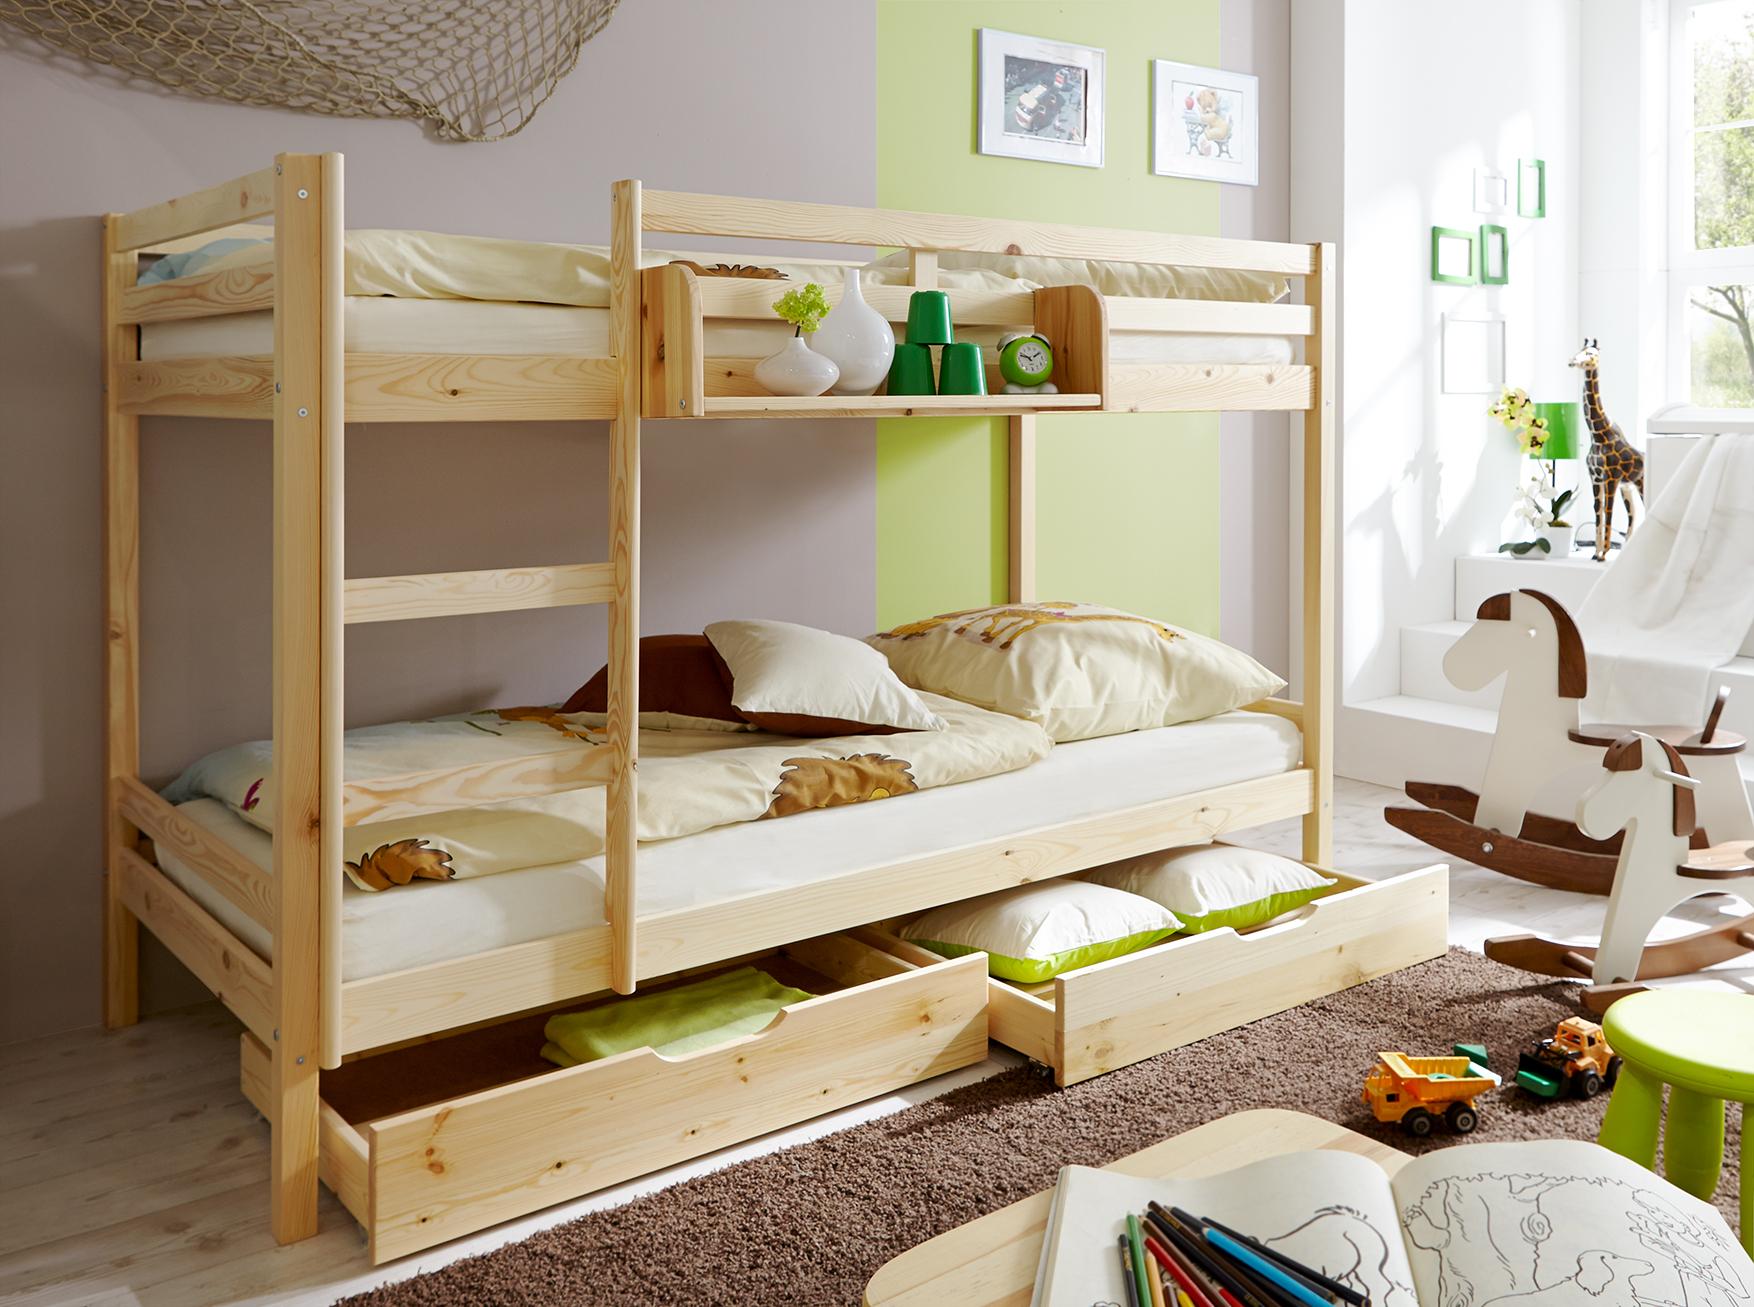 Etagenbett Nackenrolle : Etagenbett doppelbett stockbett rene kiefer massiv natur kind und baby